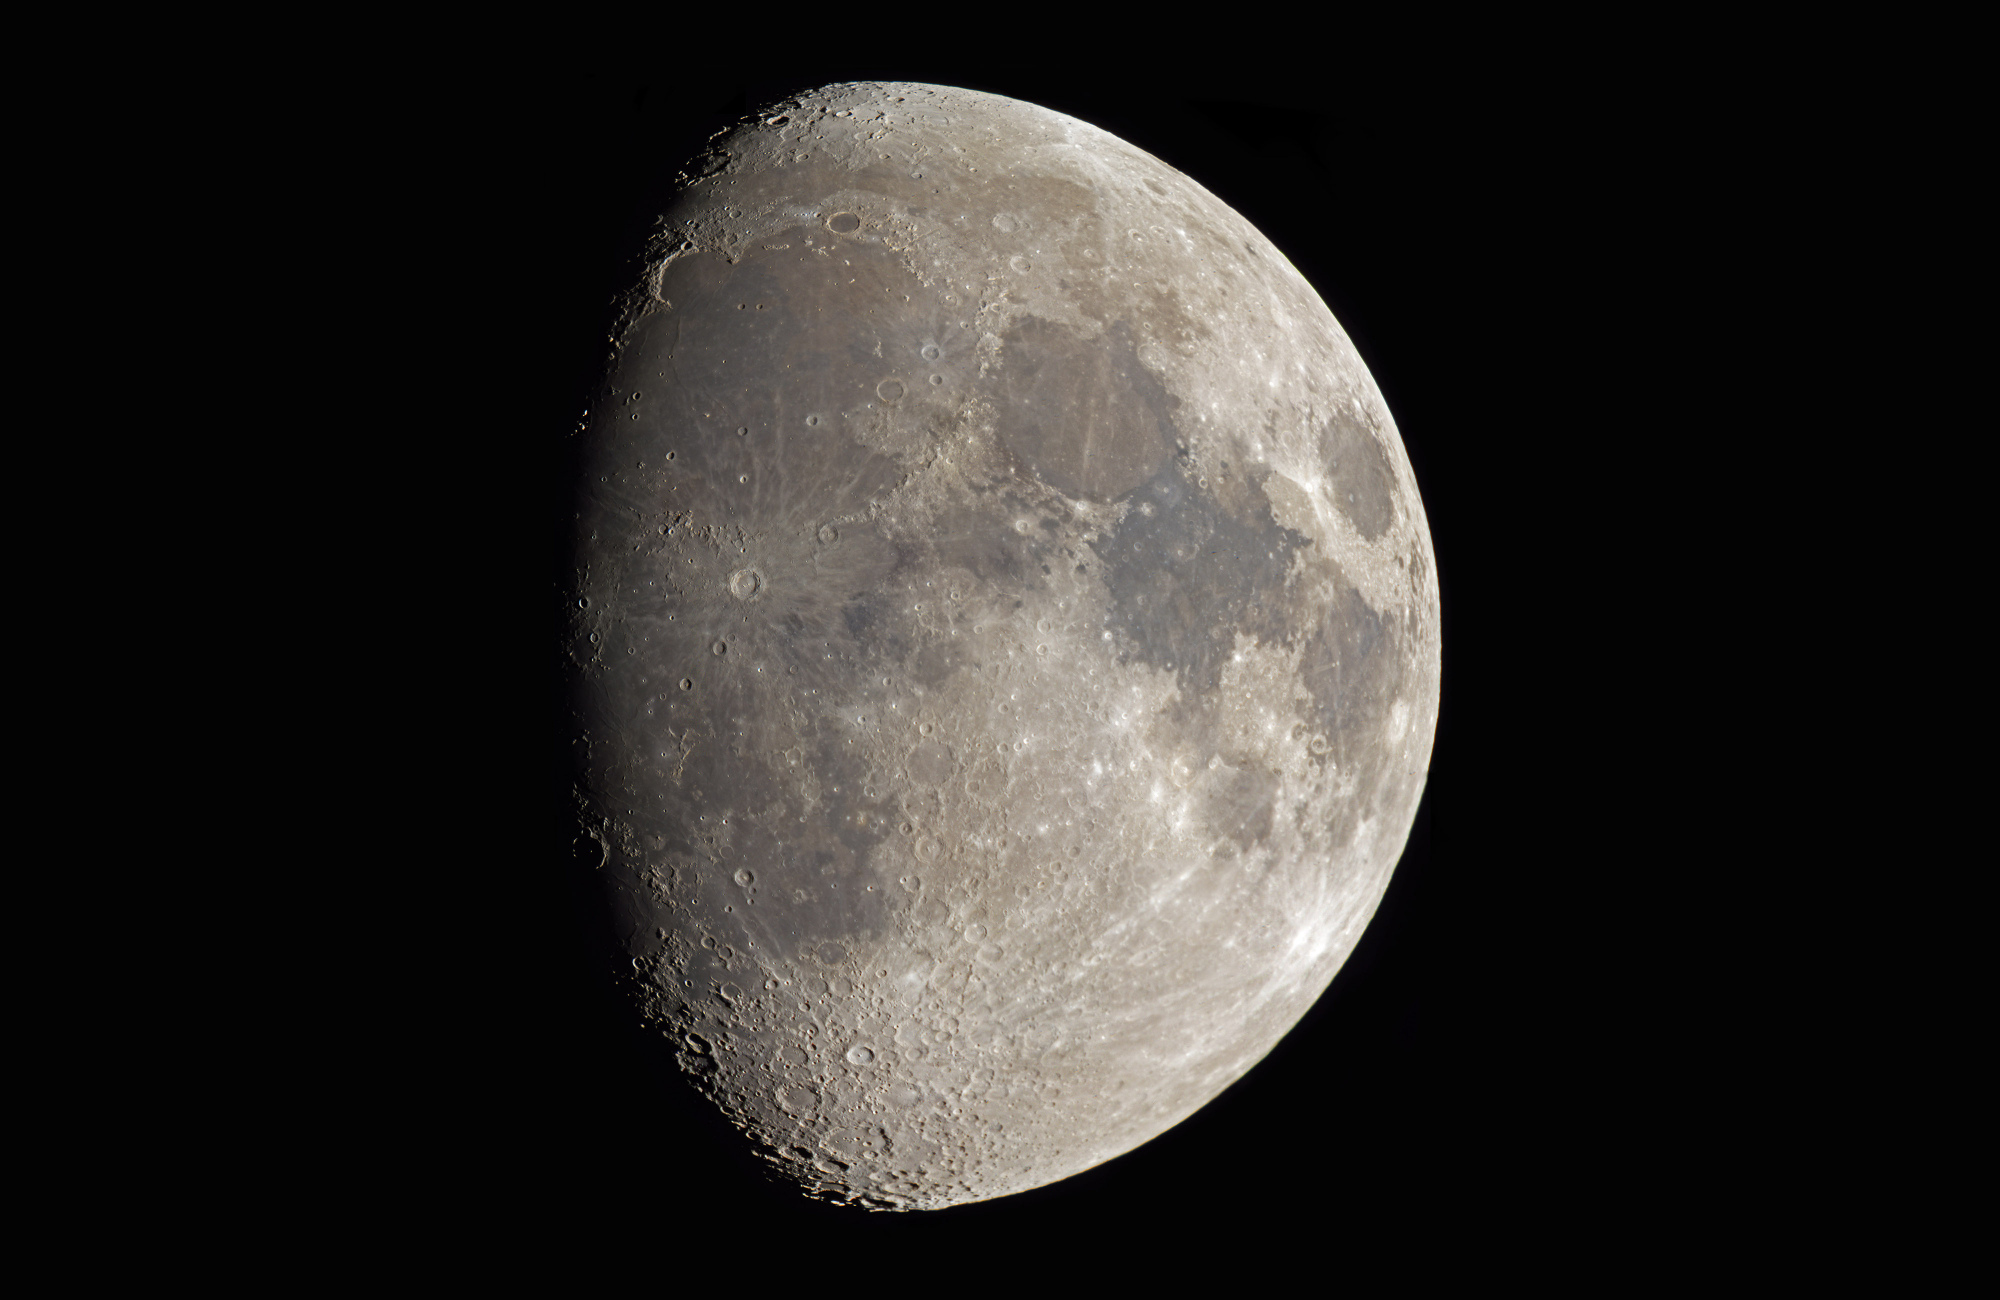 Lune 30 octobre 2017 V3 BD.jpg